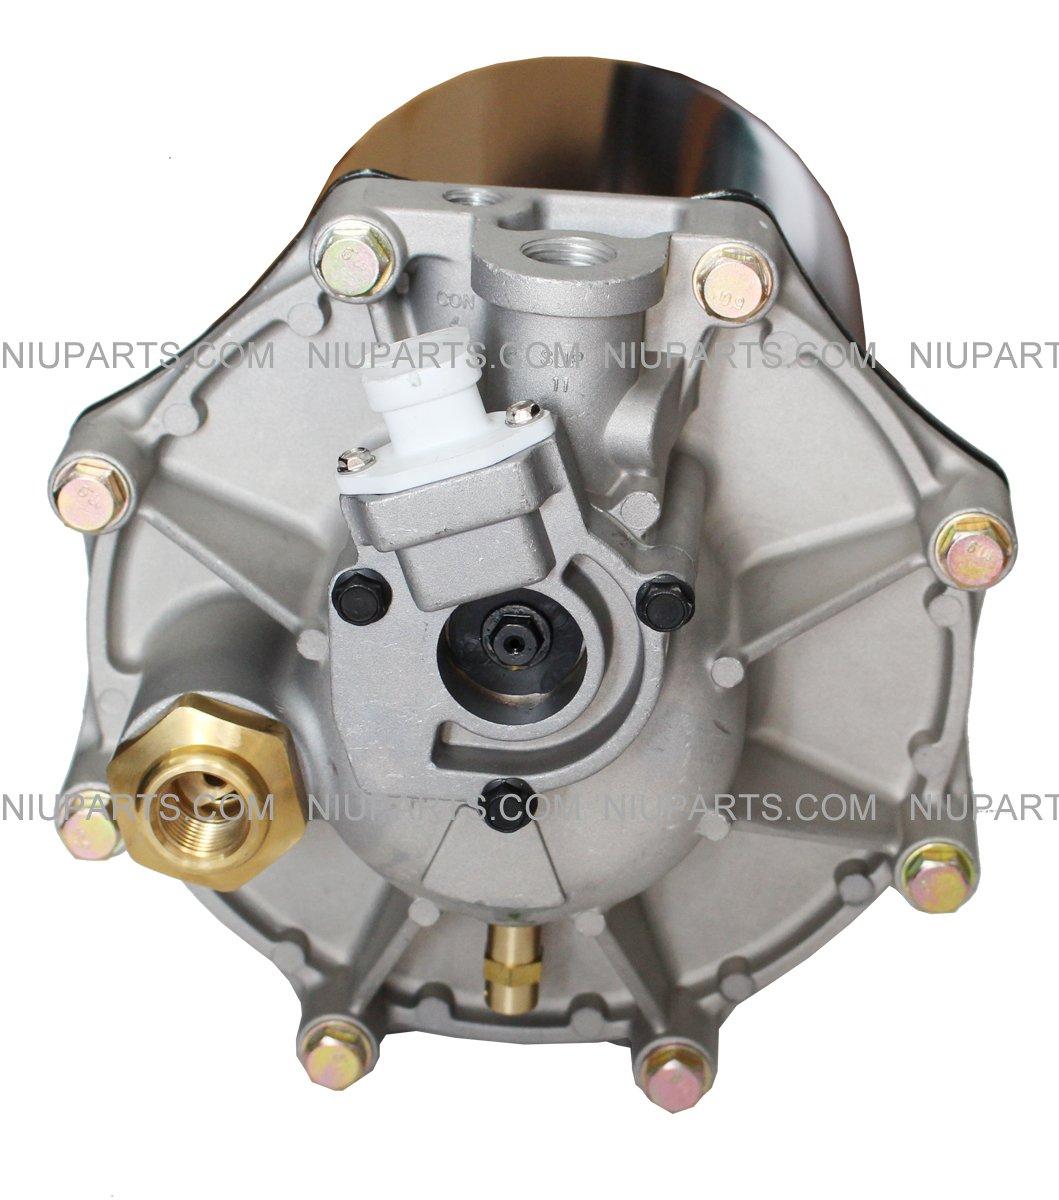 SKF BR930485 Rear Wheel Hub Bearing Assembly Timken HA590202 WJB WA512353 Moog 512353 Cross Reference